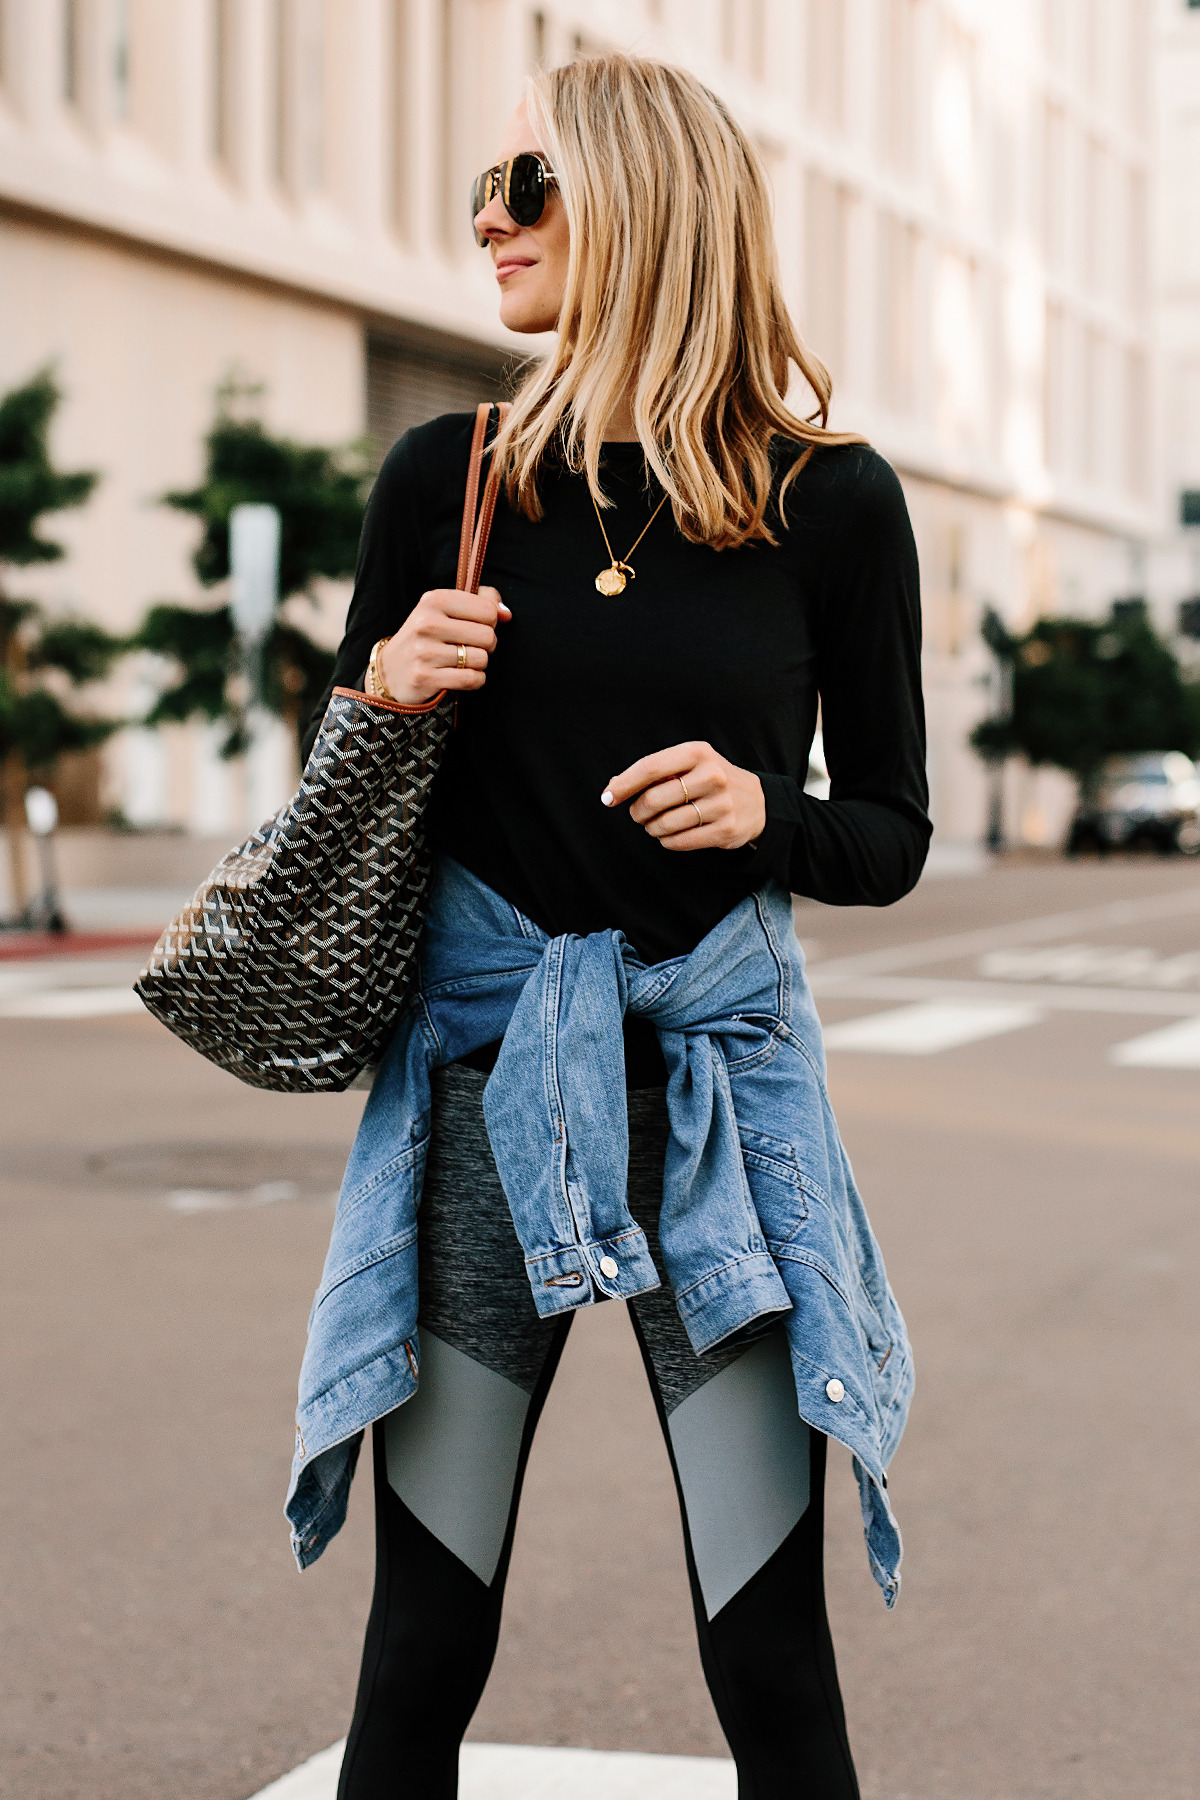 Blonde Woman Wearing Black Long Sleeve Top Denim Jacket Reebok Colorblock Leggings Goyard Tote Fashion Jackson San Diego Fashion Blogger Athleisure Outfit